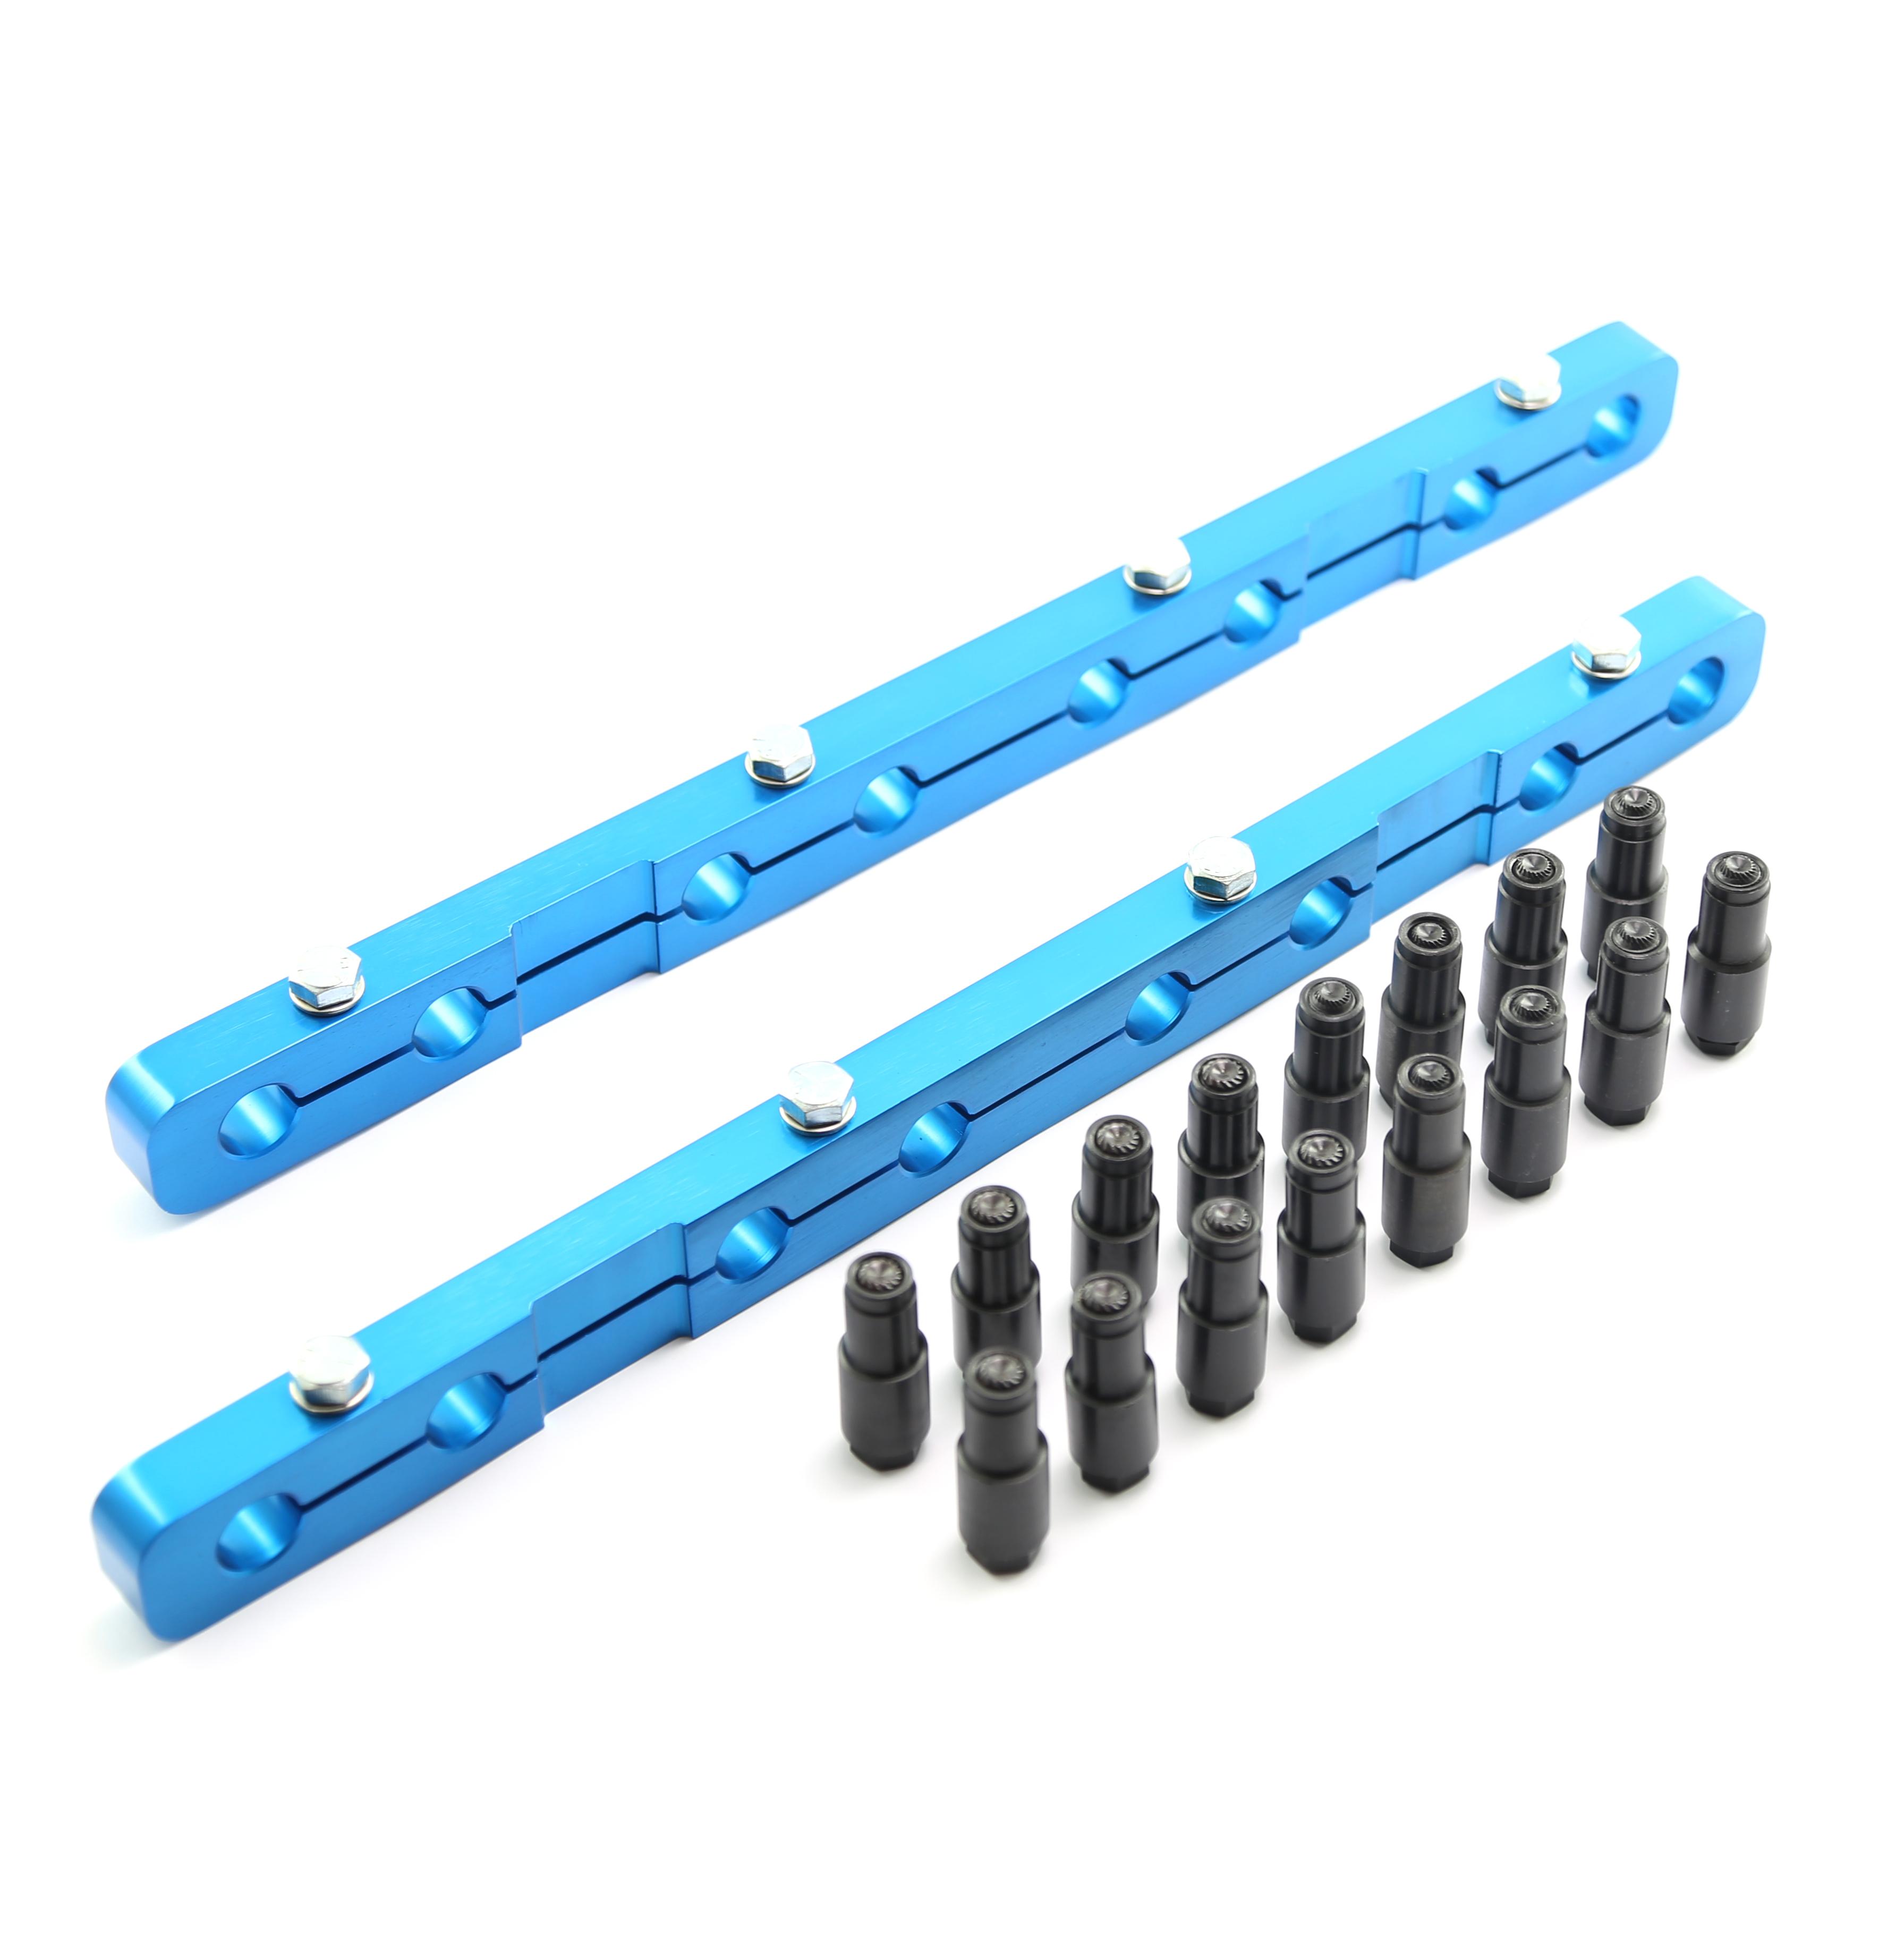 Oldsmobile 400 425 455 Rocker Stud Girdle Kit Blue With Posi Locks